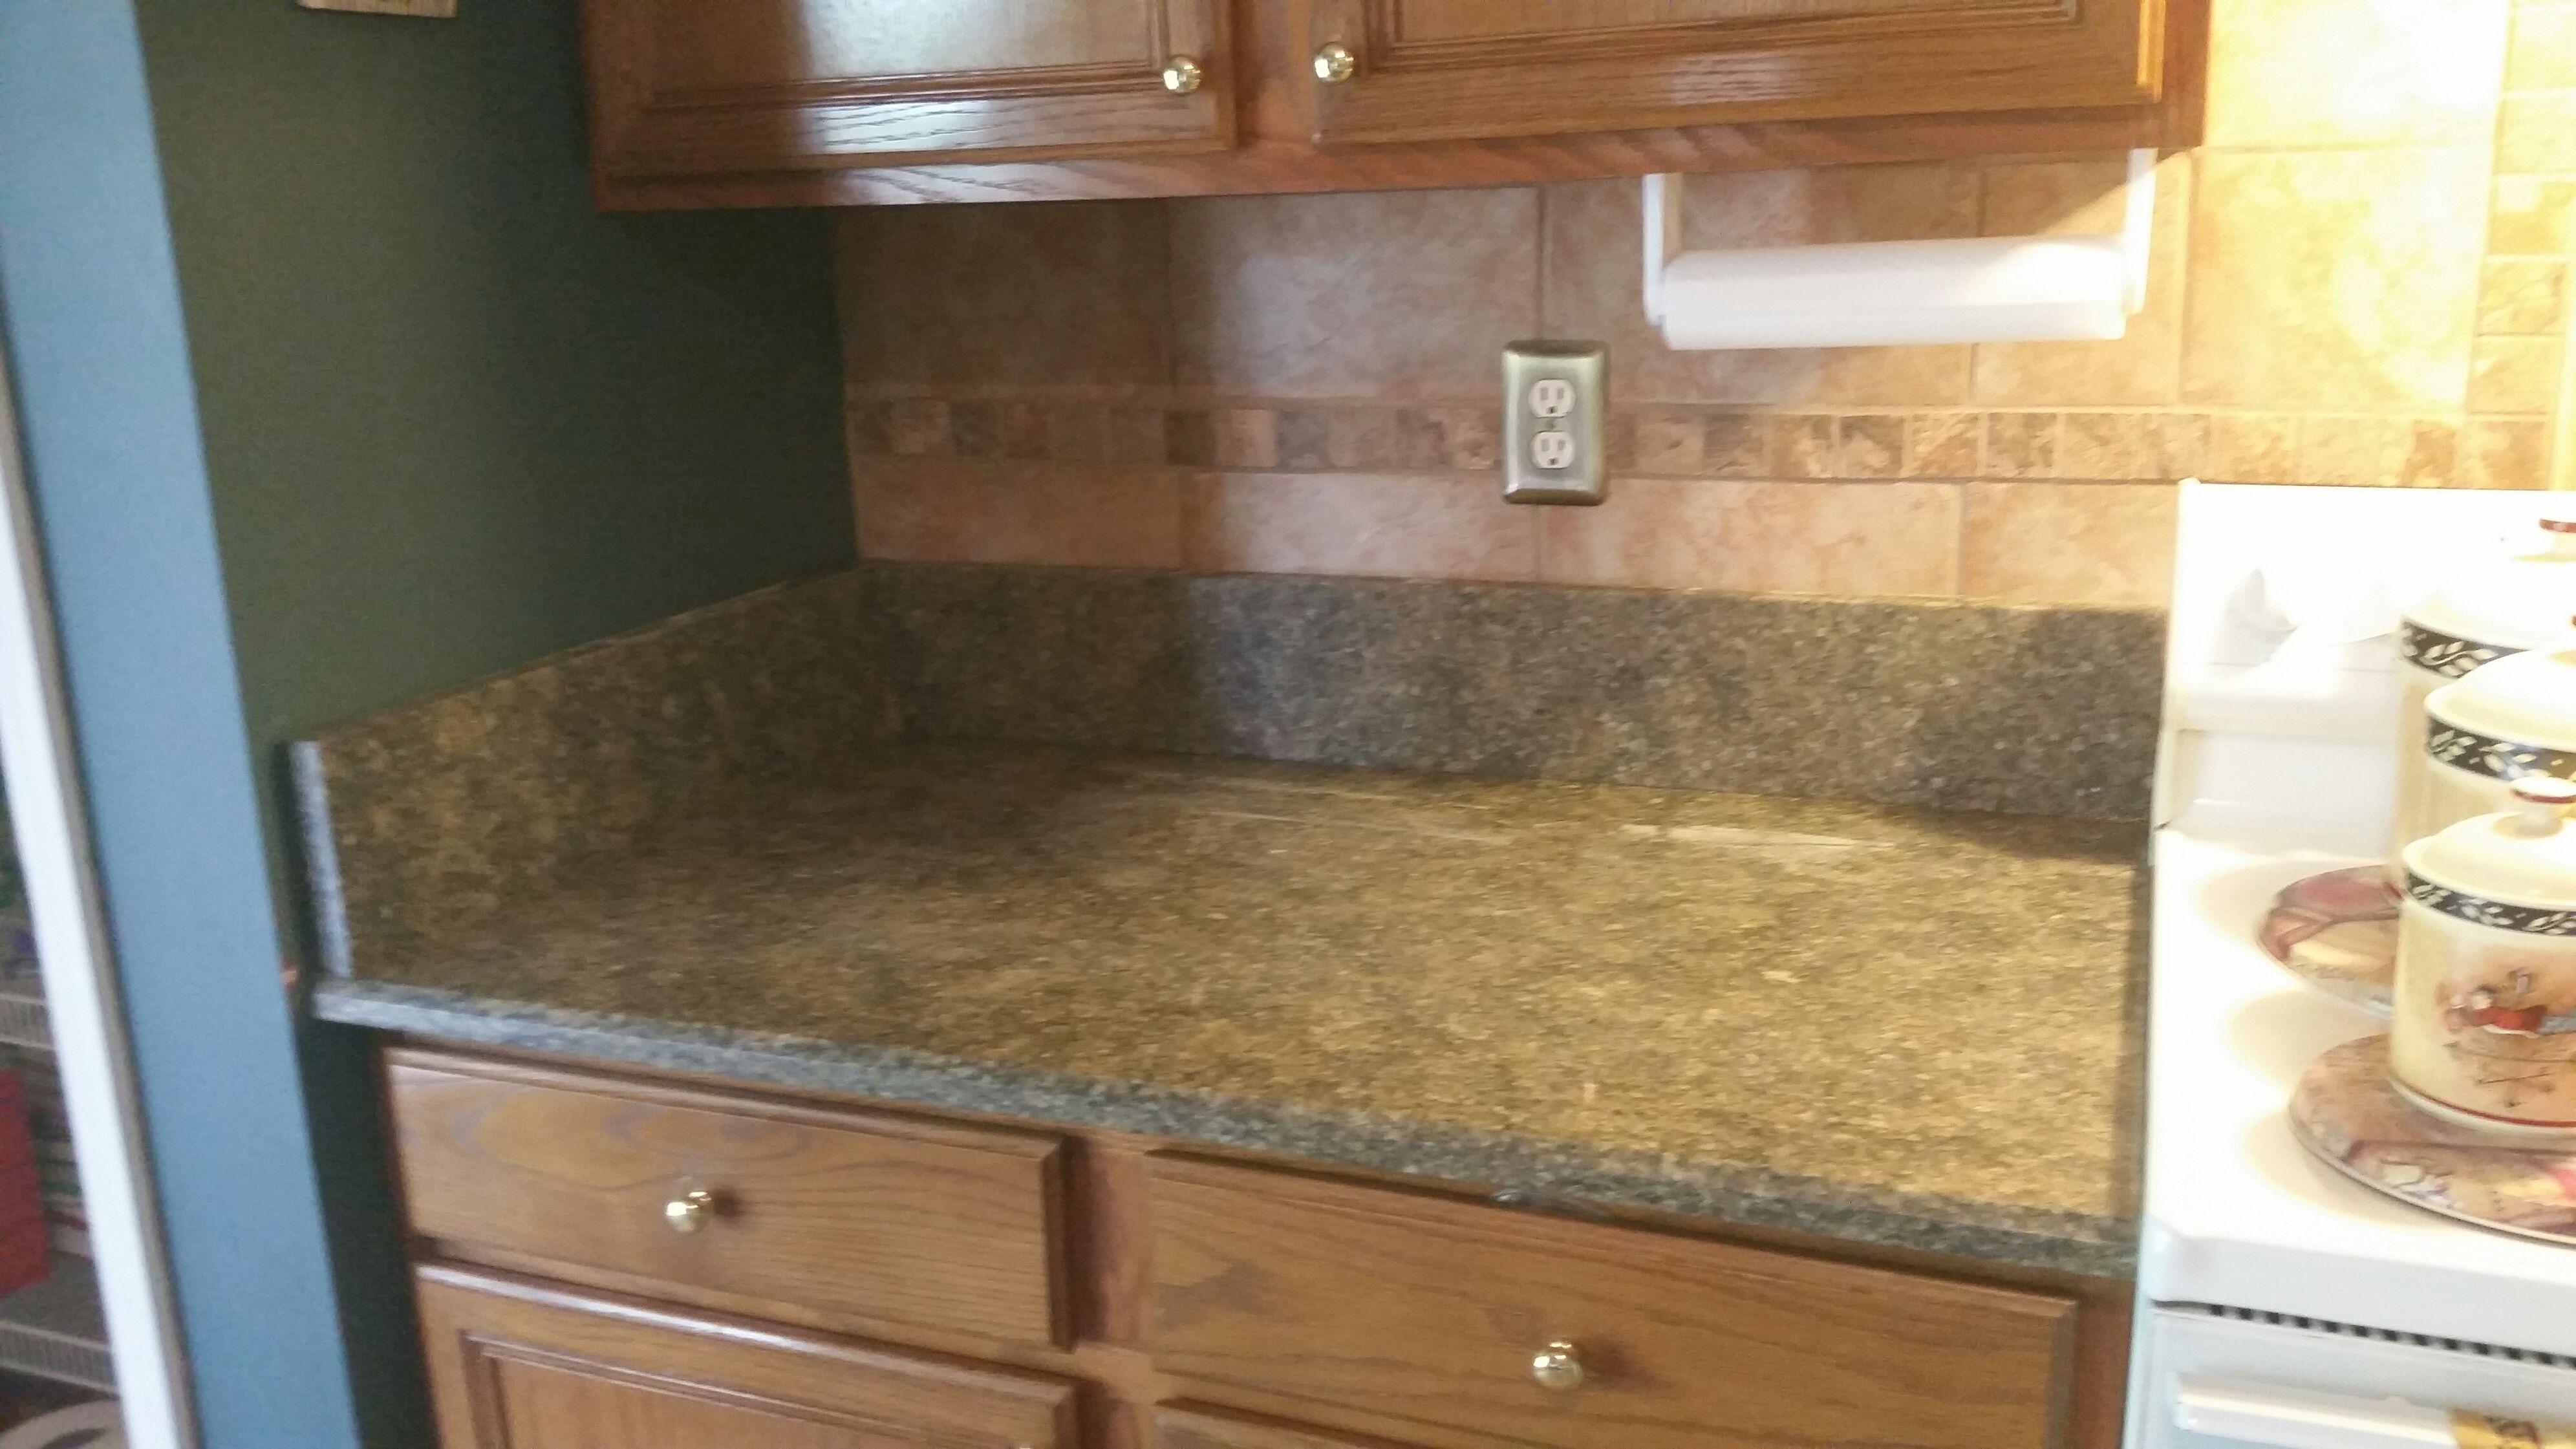 wildwood lg viatera quartz kitchen countertop install for buuck